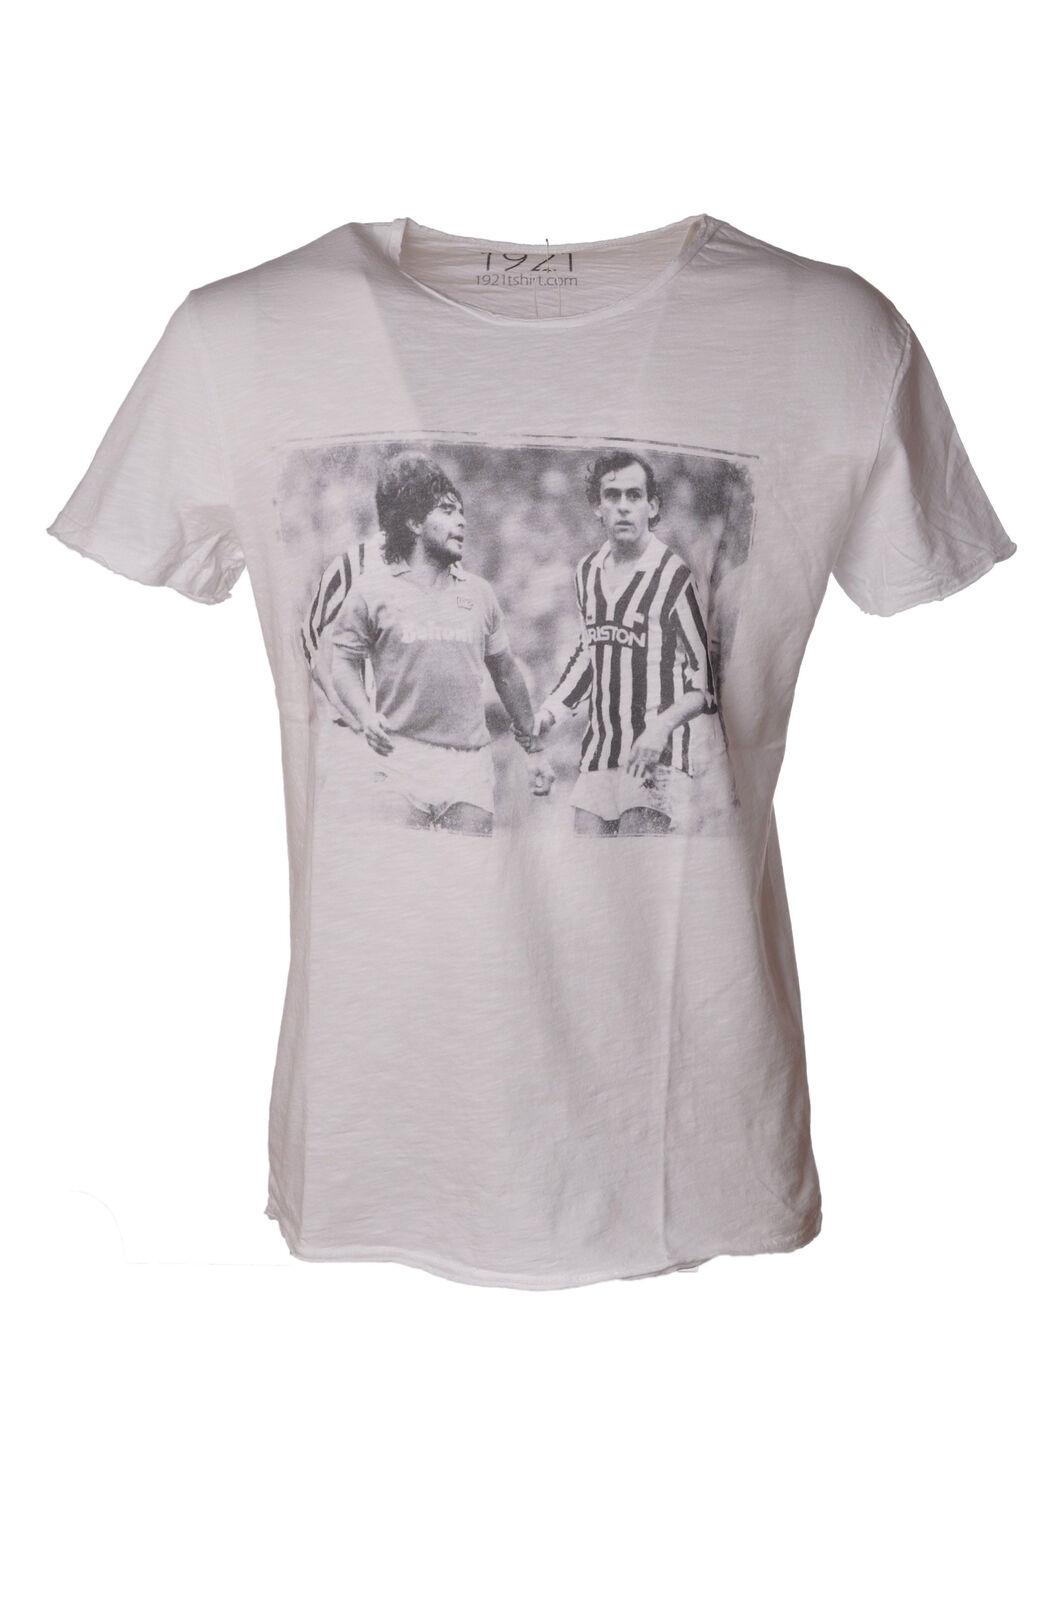 1921 - Topwear-T-shirts - Mann - Weiß - 4044621G181408